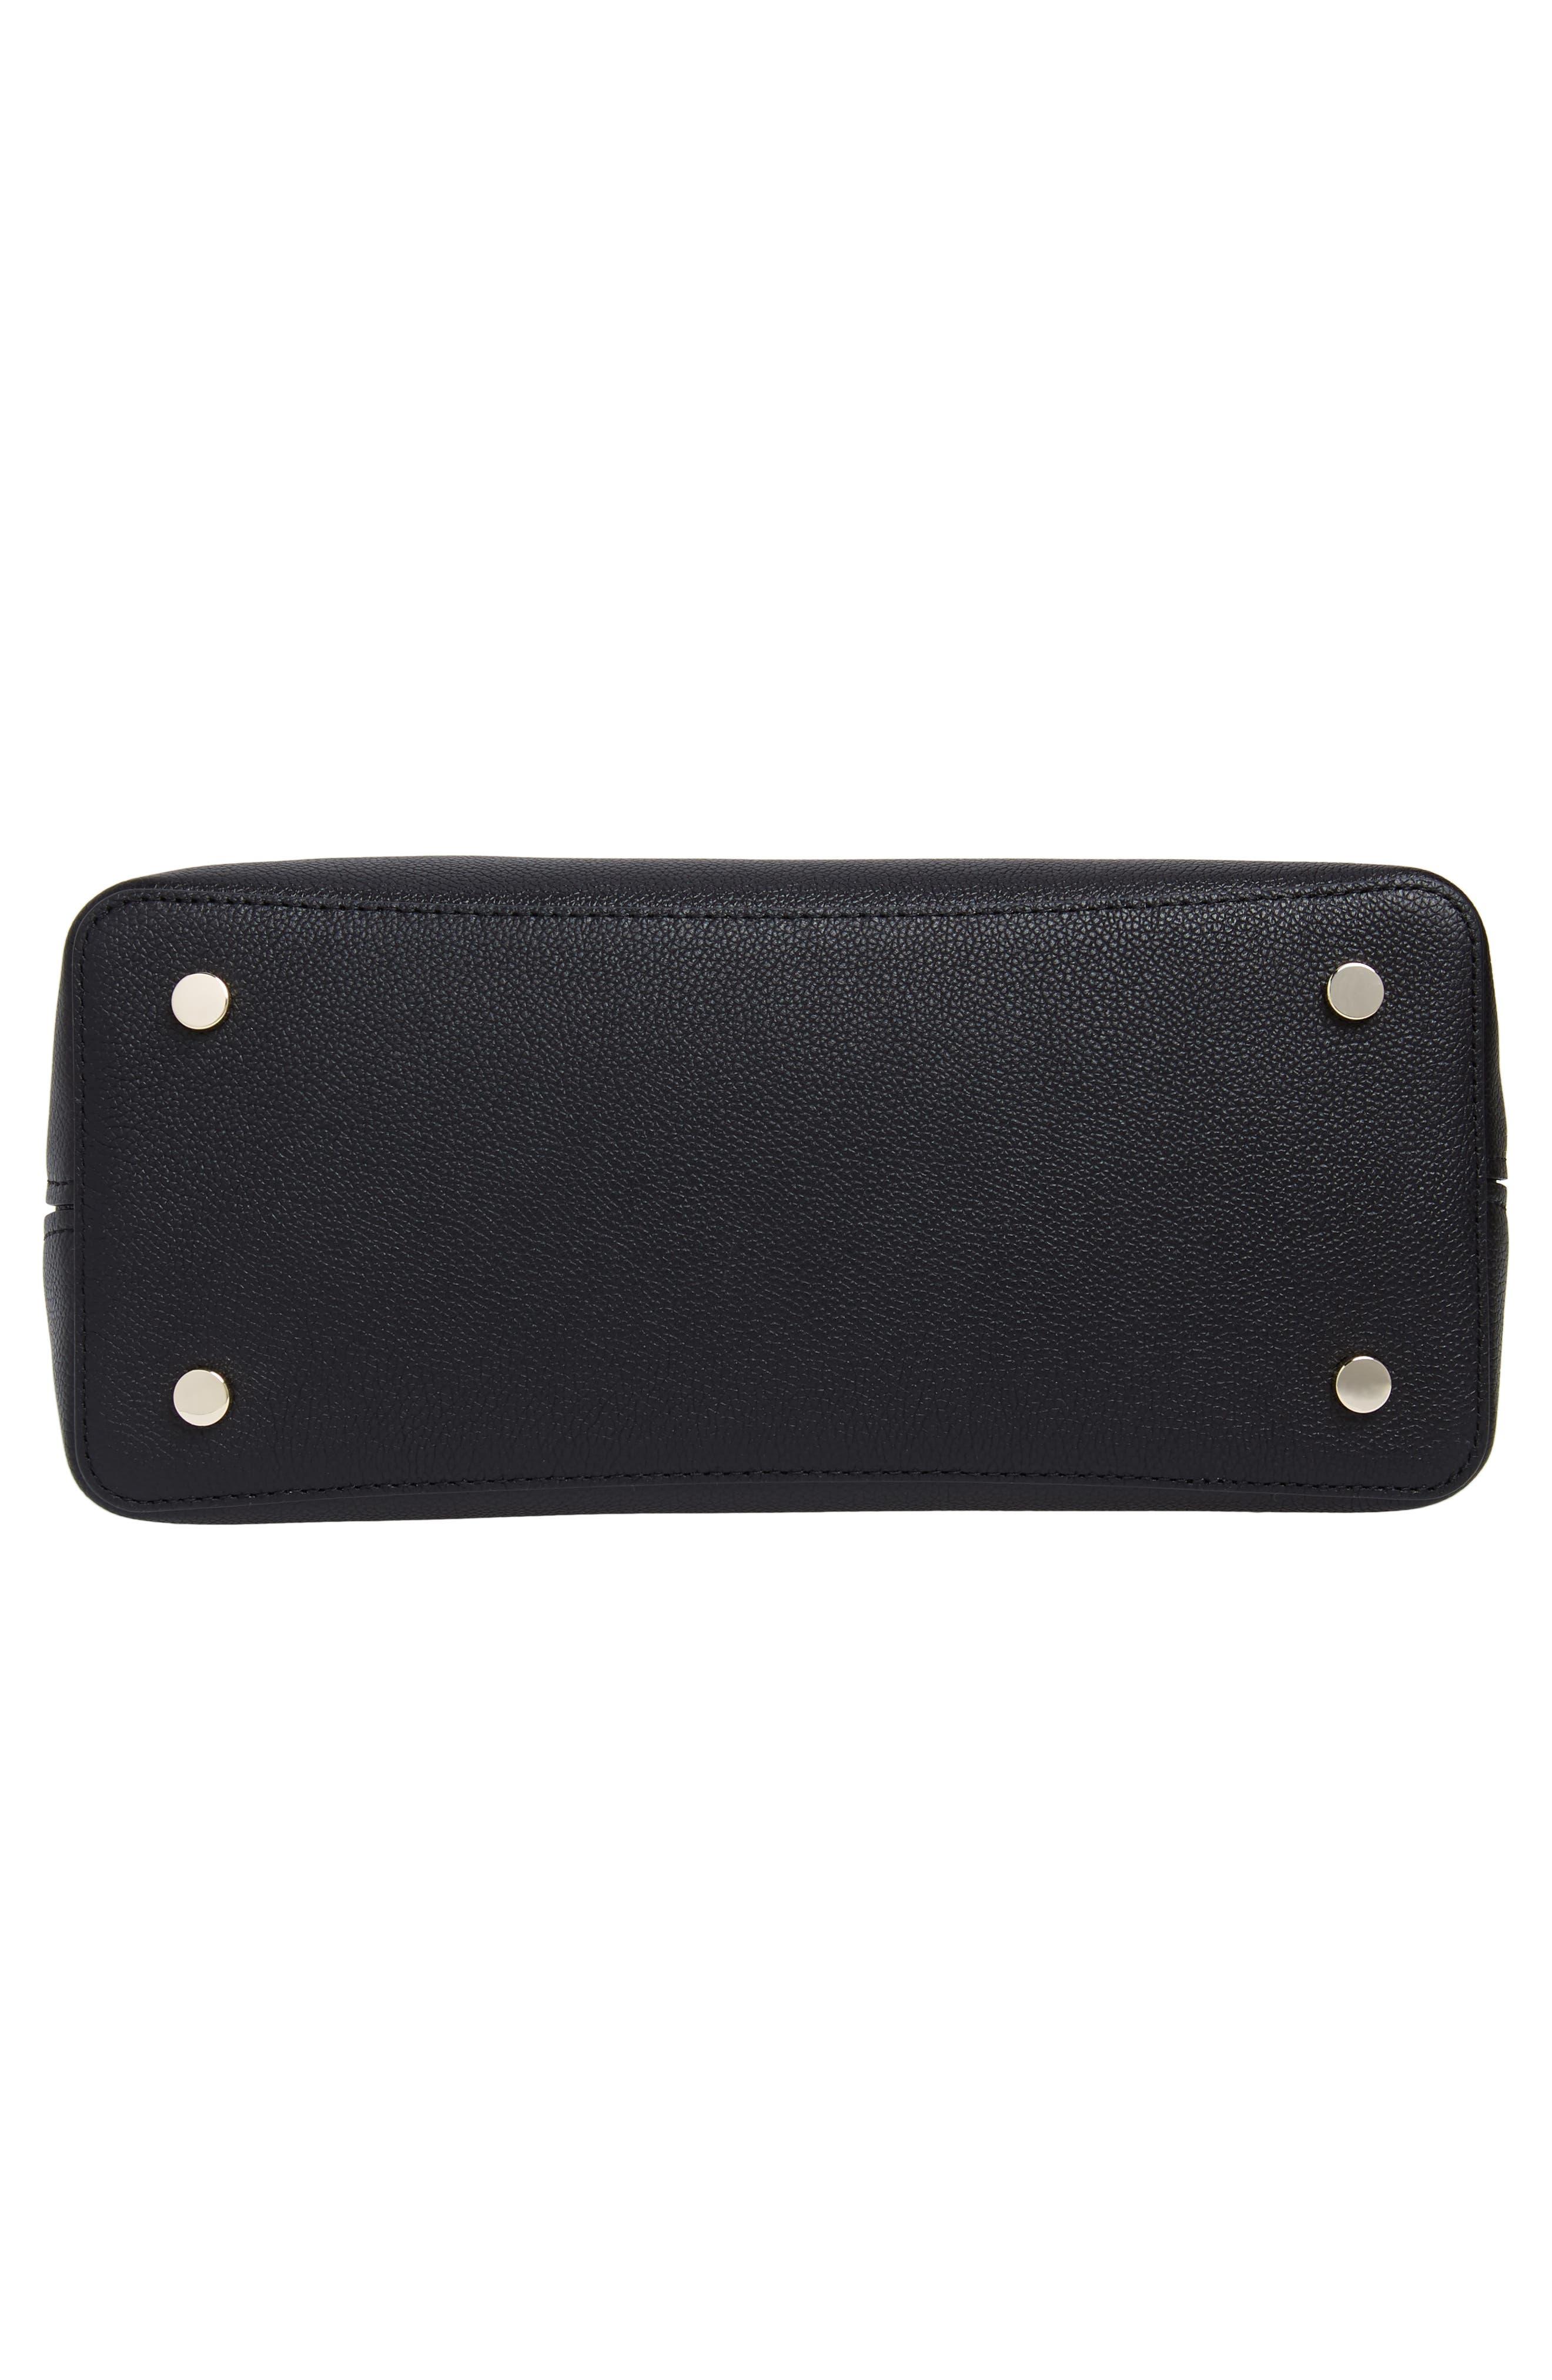 KATE SPADE NEW YORK,                             large margaux leather satchel,                             Alternate thumbnail 6, color,                             BLACK